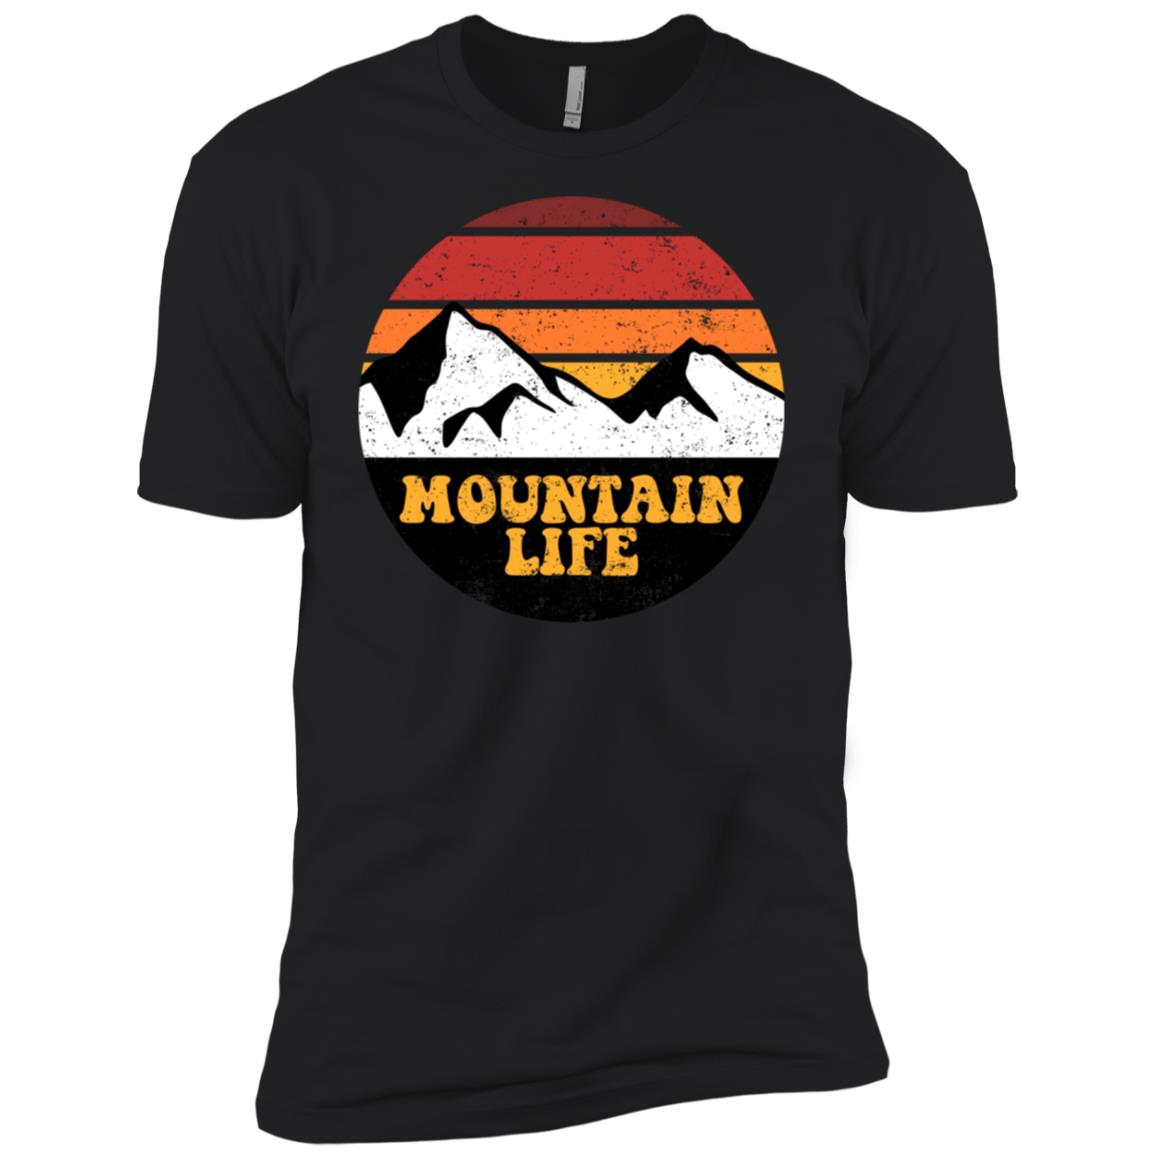 Mountain Life Keep it Simple Retro Hiking Camping Ls Tee Men Short Sleeve T-Shirt